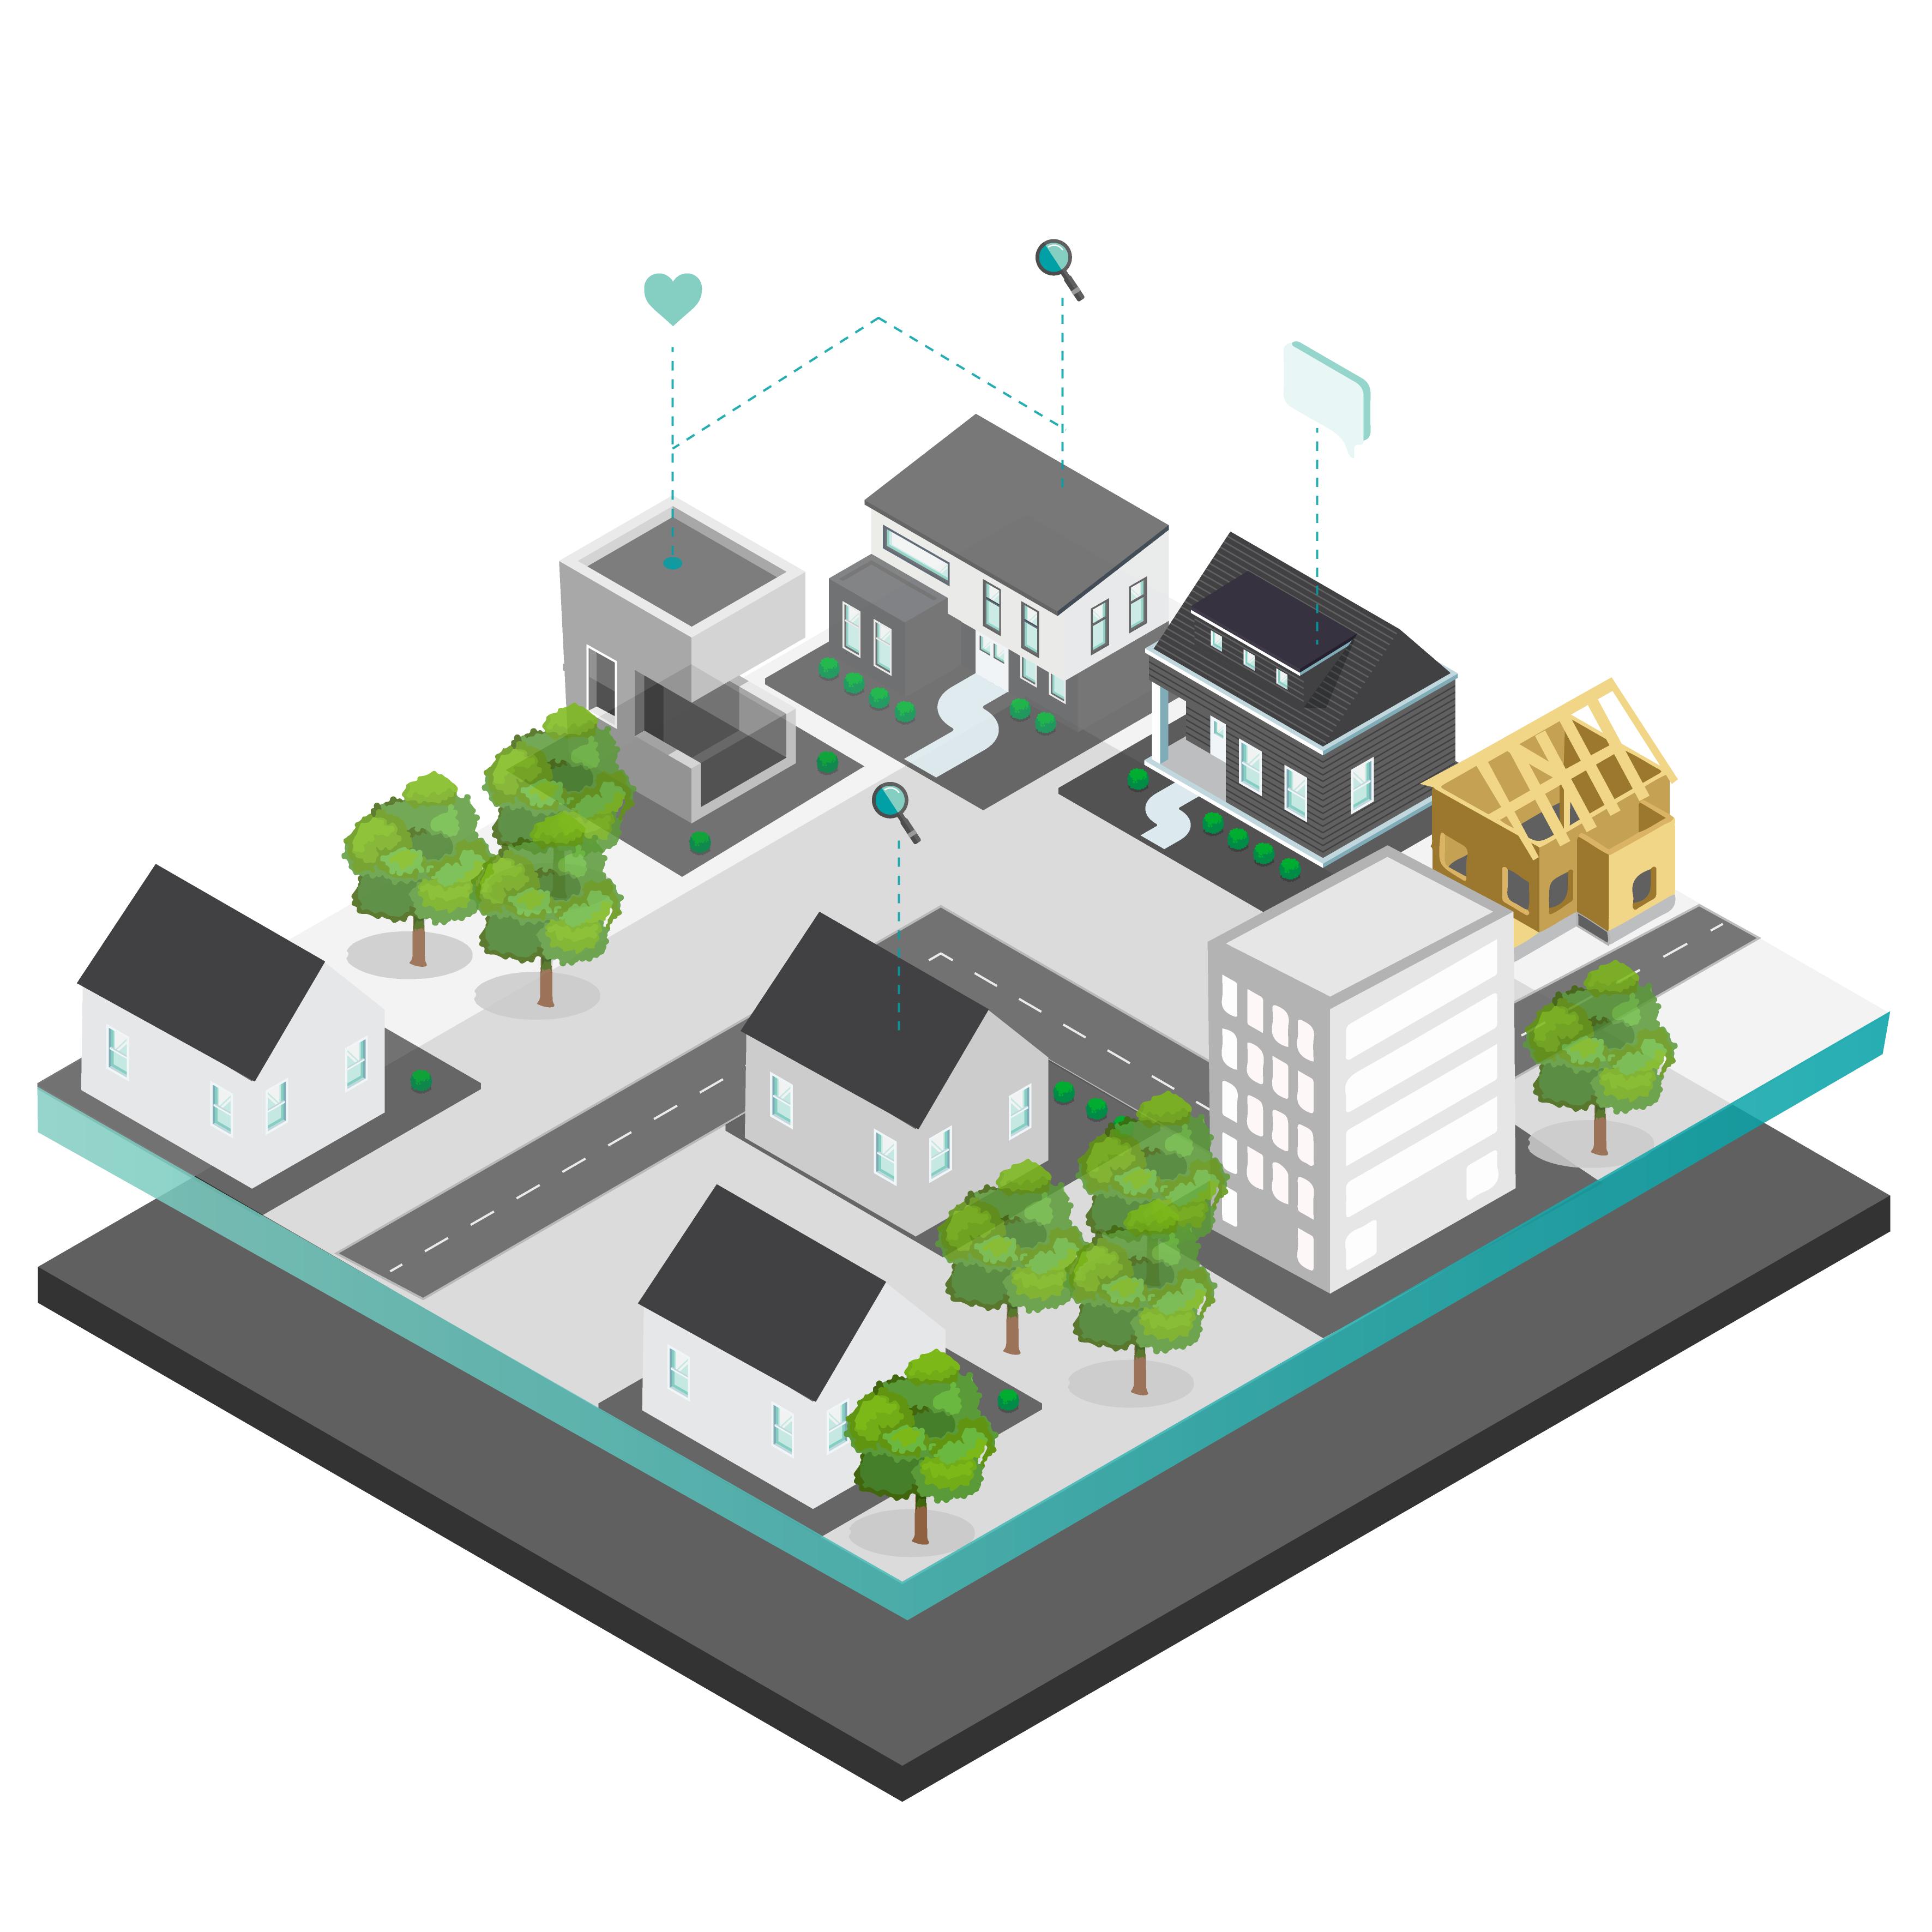 How OpenHouse.ai Uses Geospatial Technology